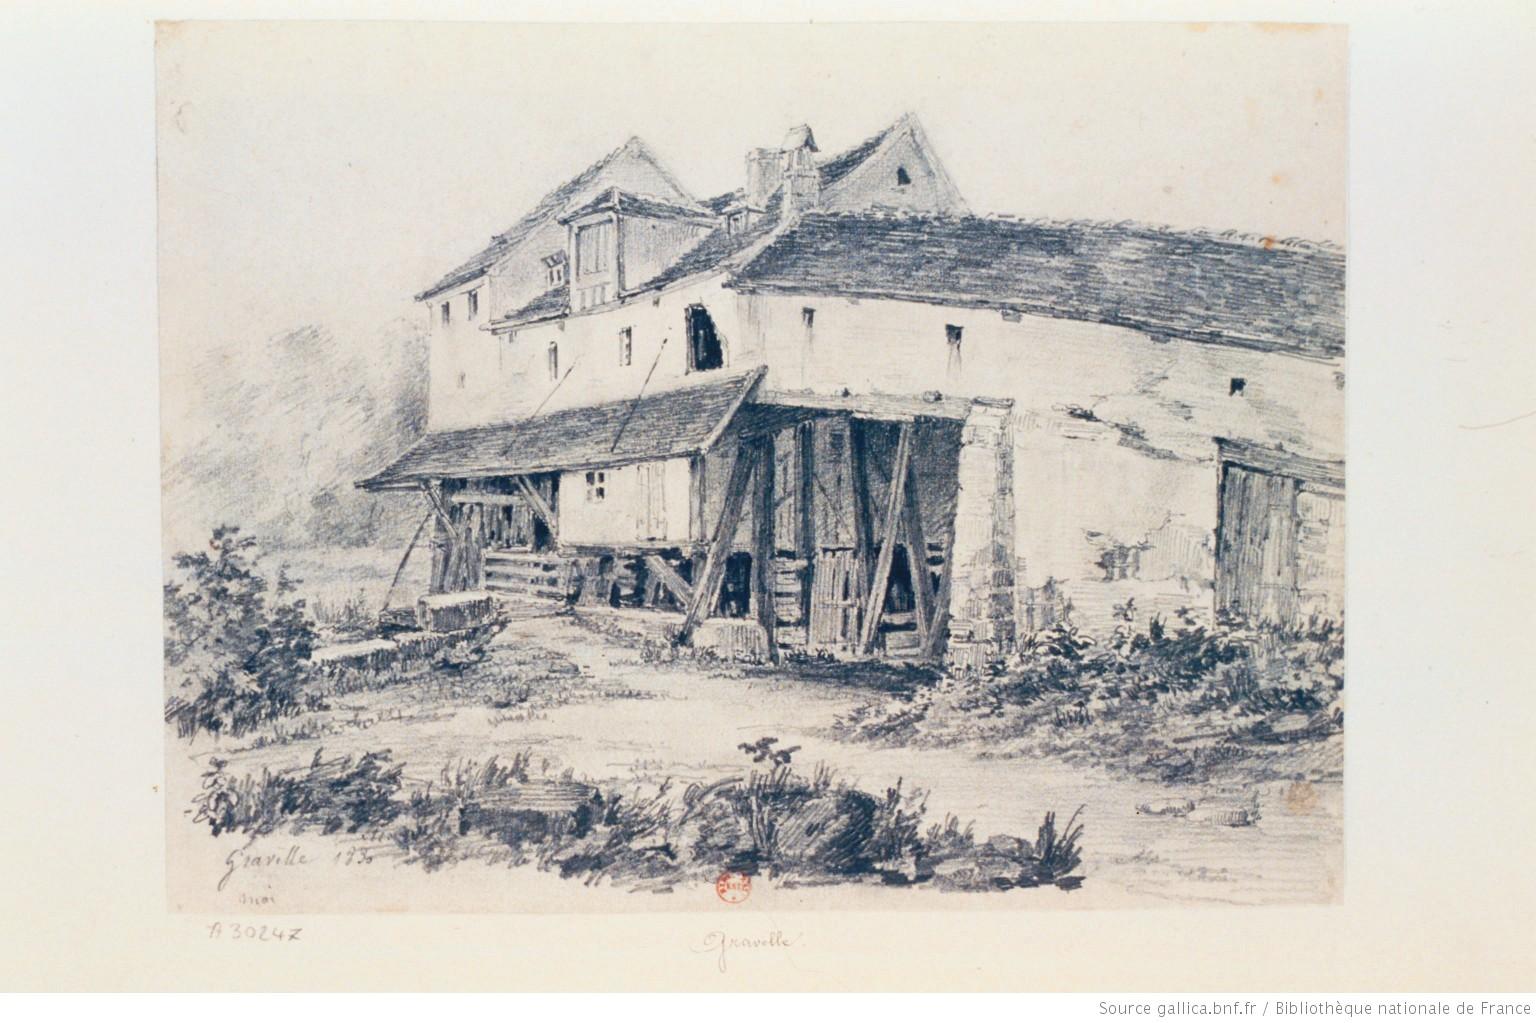 gravelle_vue-damont-1830-gallica